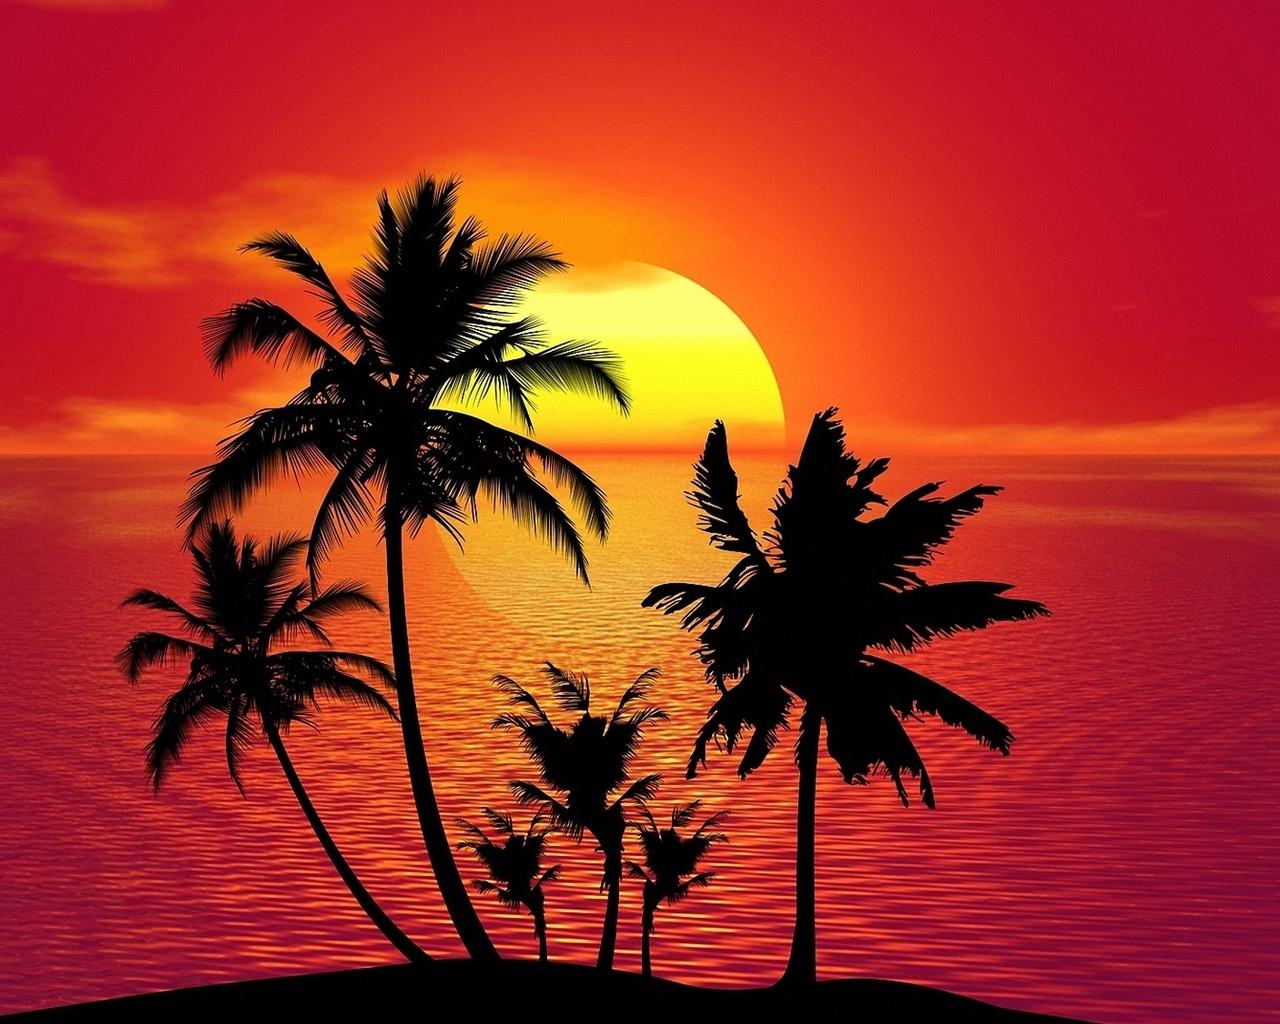 пальмы, на фоне, моря, и заката